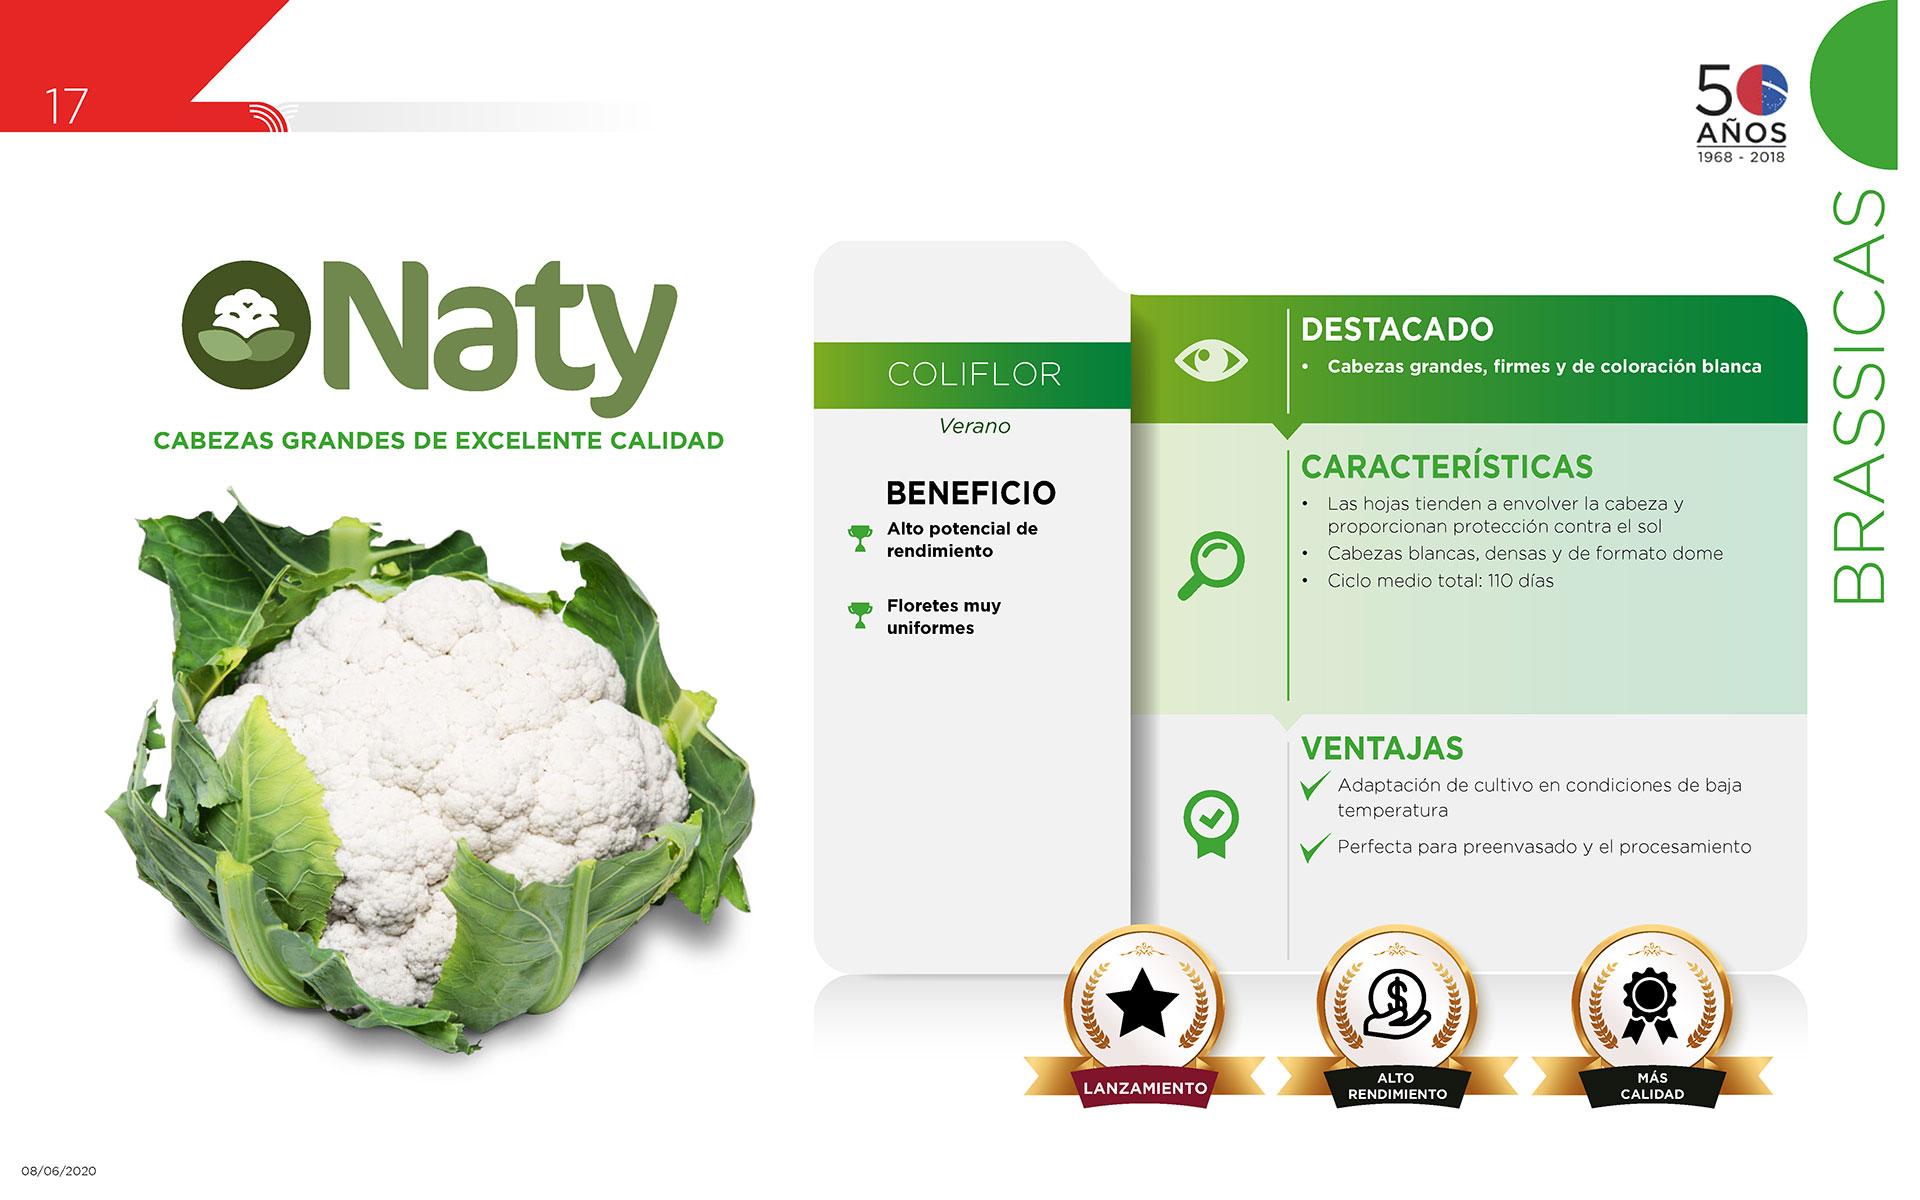 Naty - Brassicas